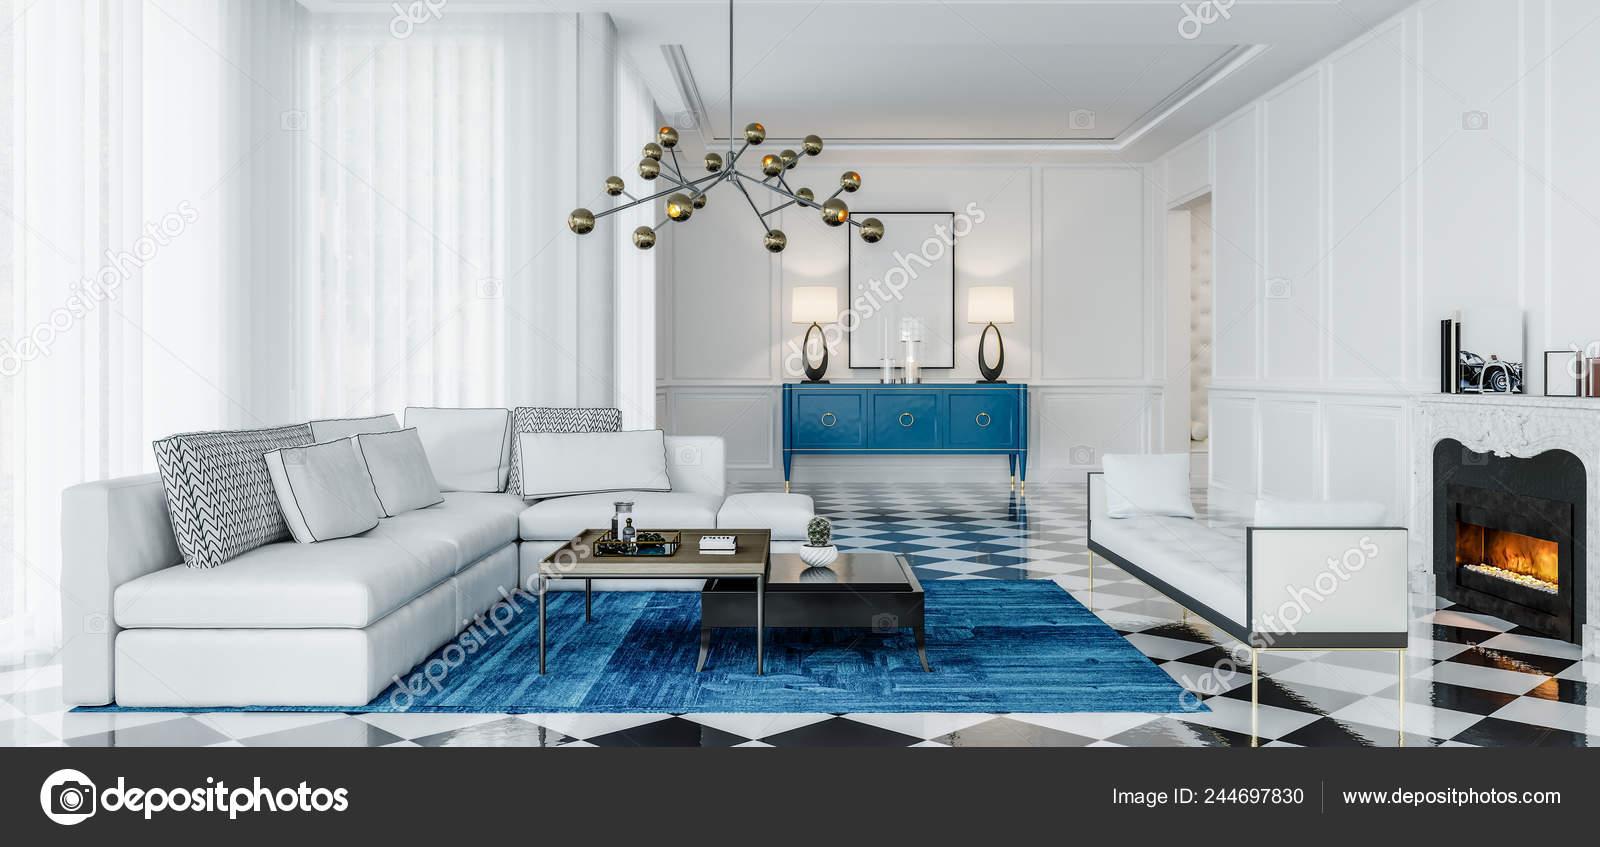 Modern Interior Design Living Room Blue, Accents For Living Room